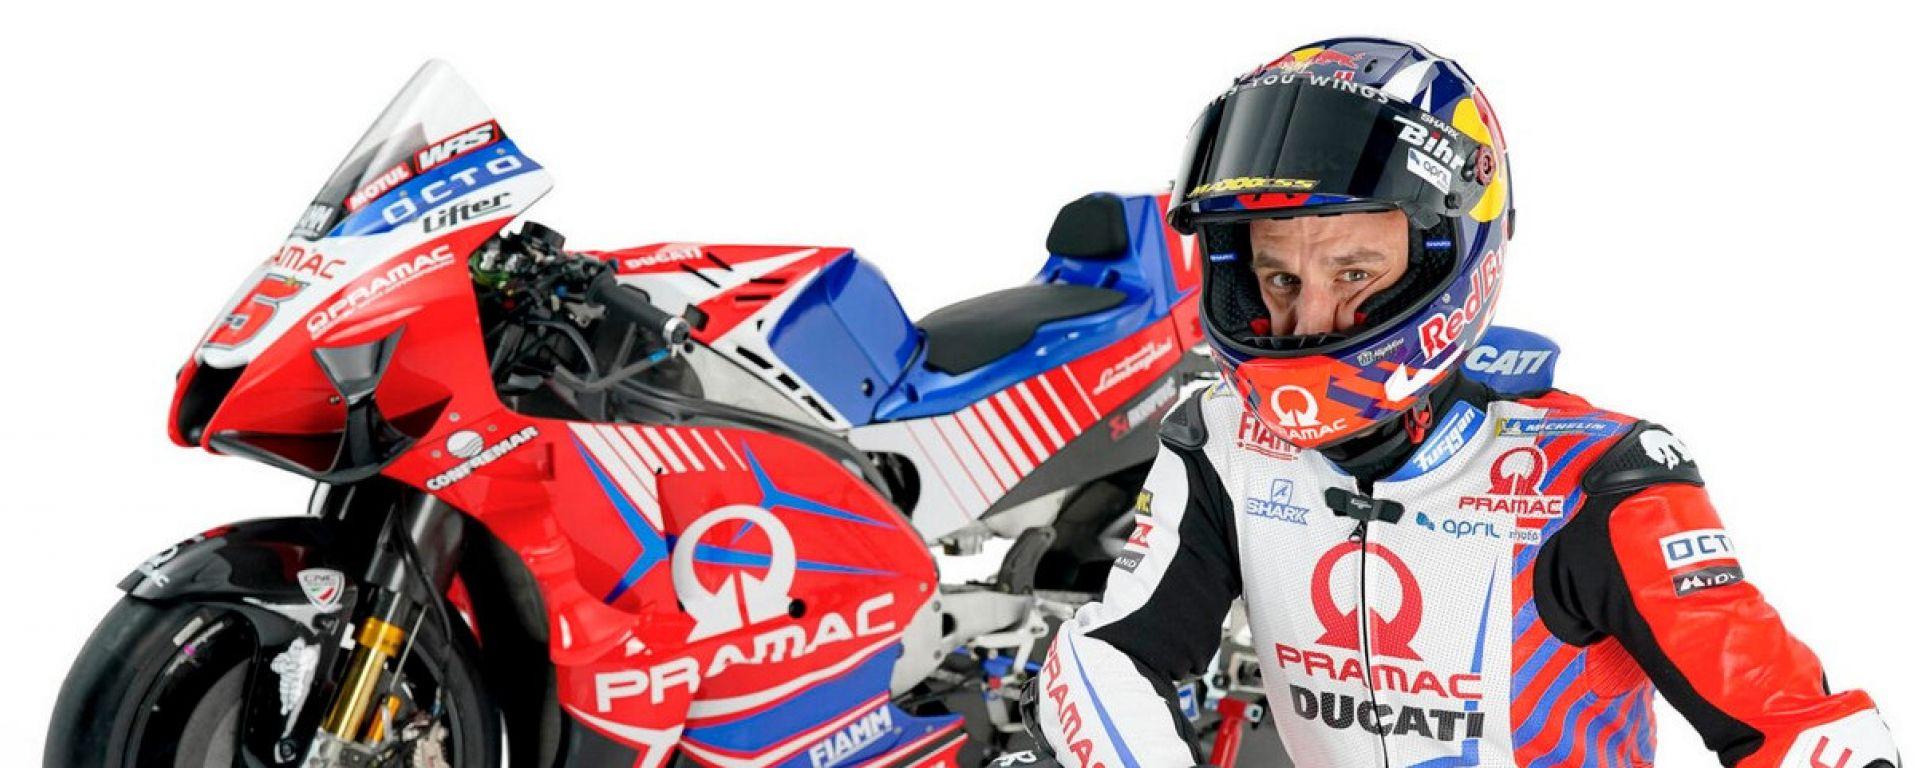 MotoGP 2021, Johann Zarco - Pramac Racing - Ducati